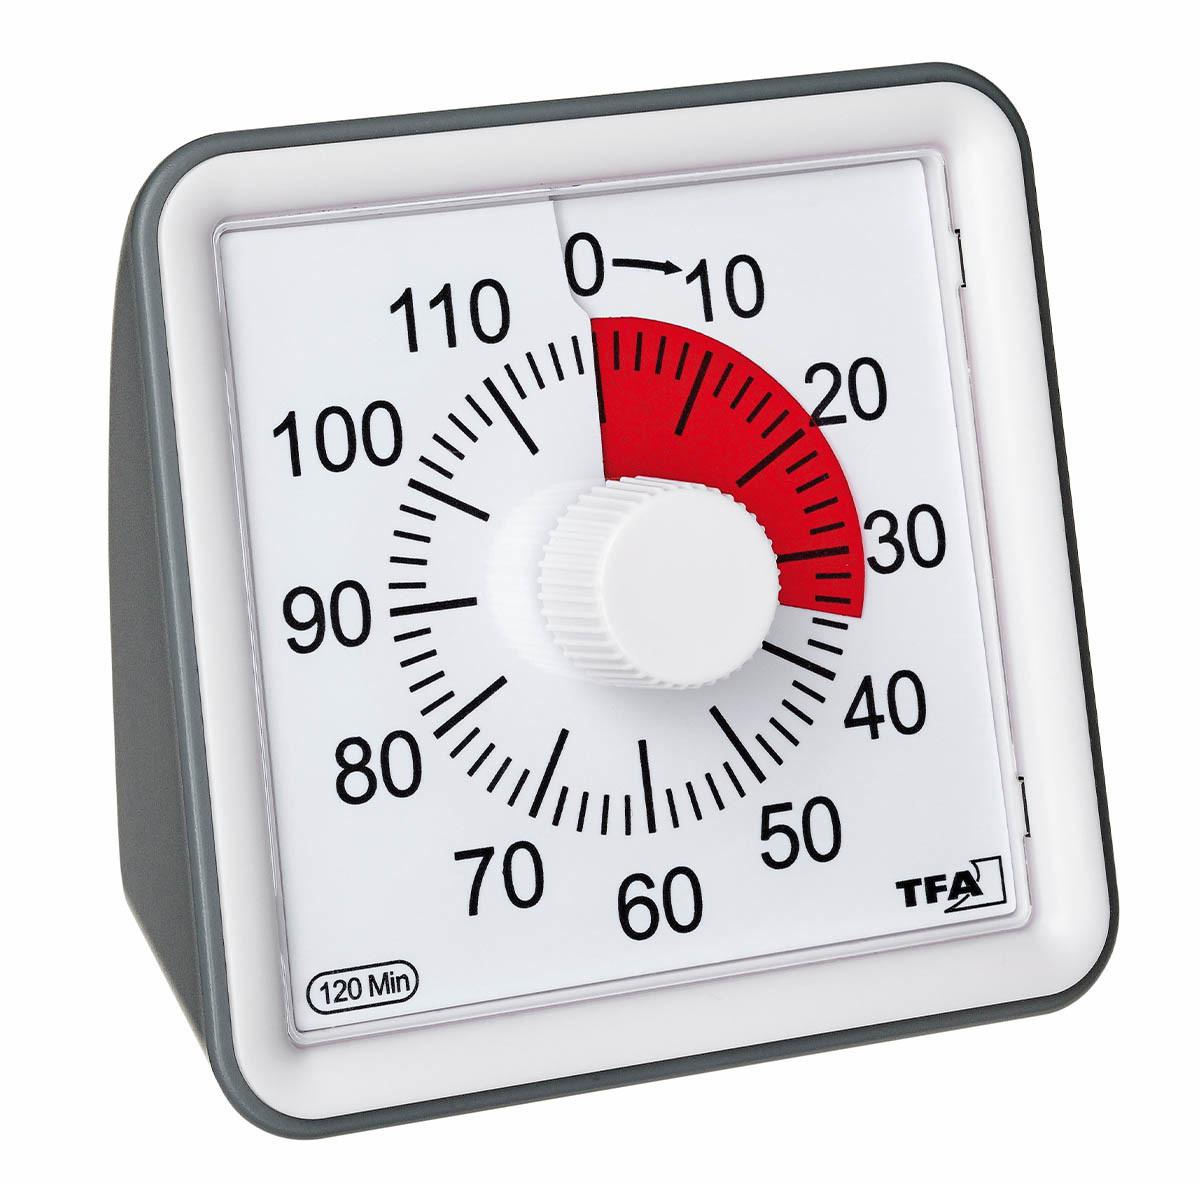 38-2043-10-timer-visual-anwendung-1200x1200px.jpg